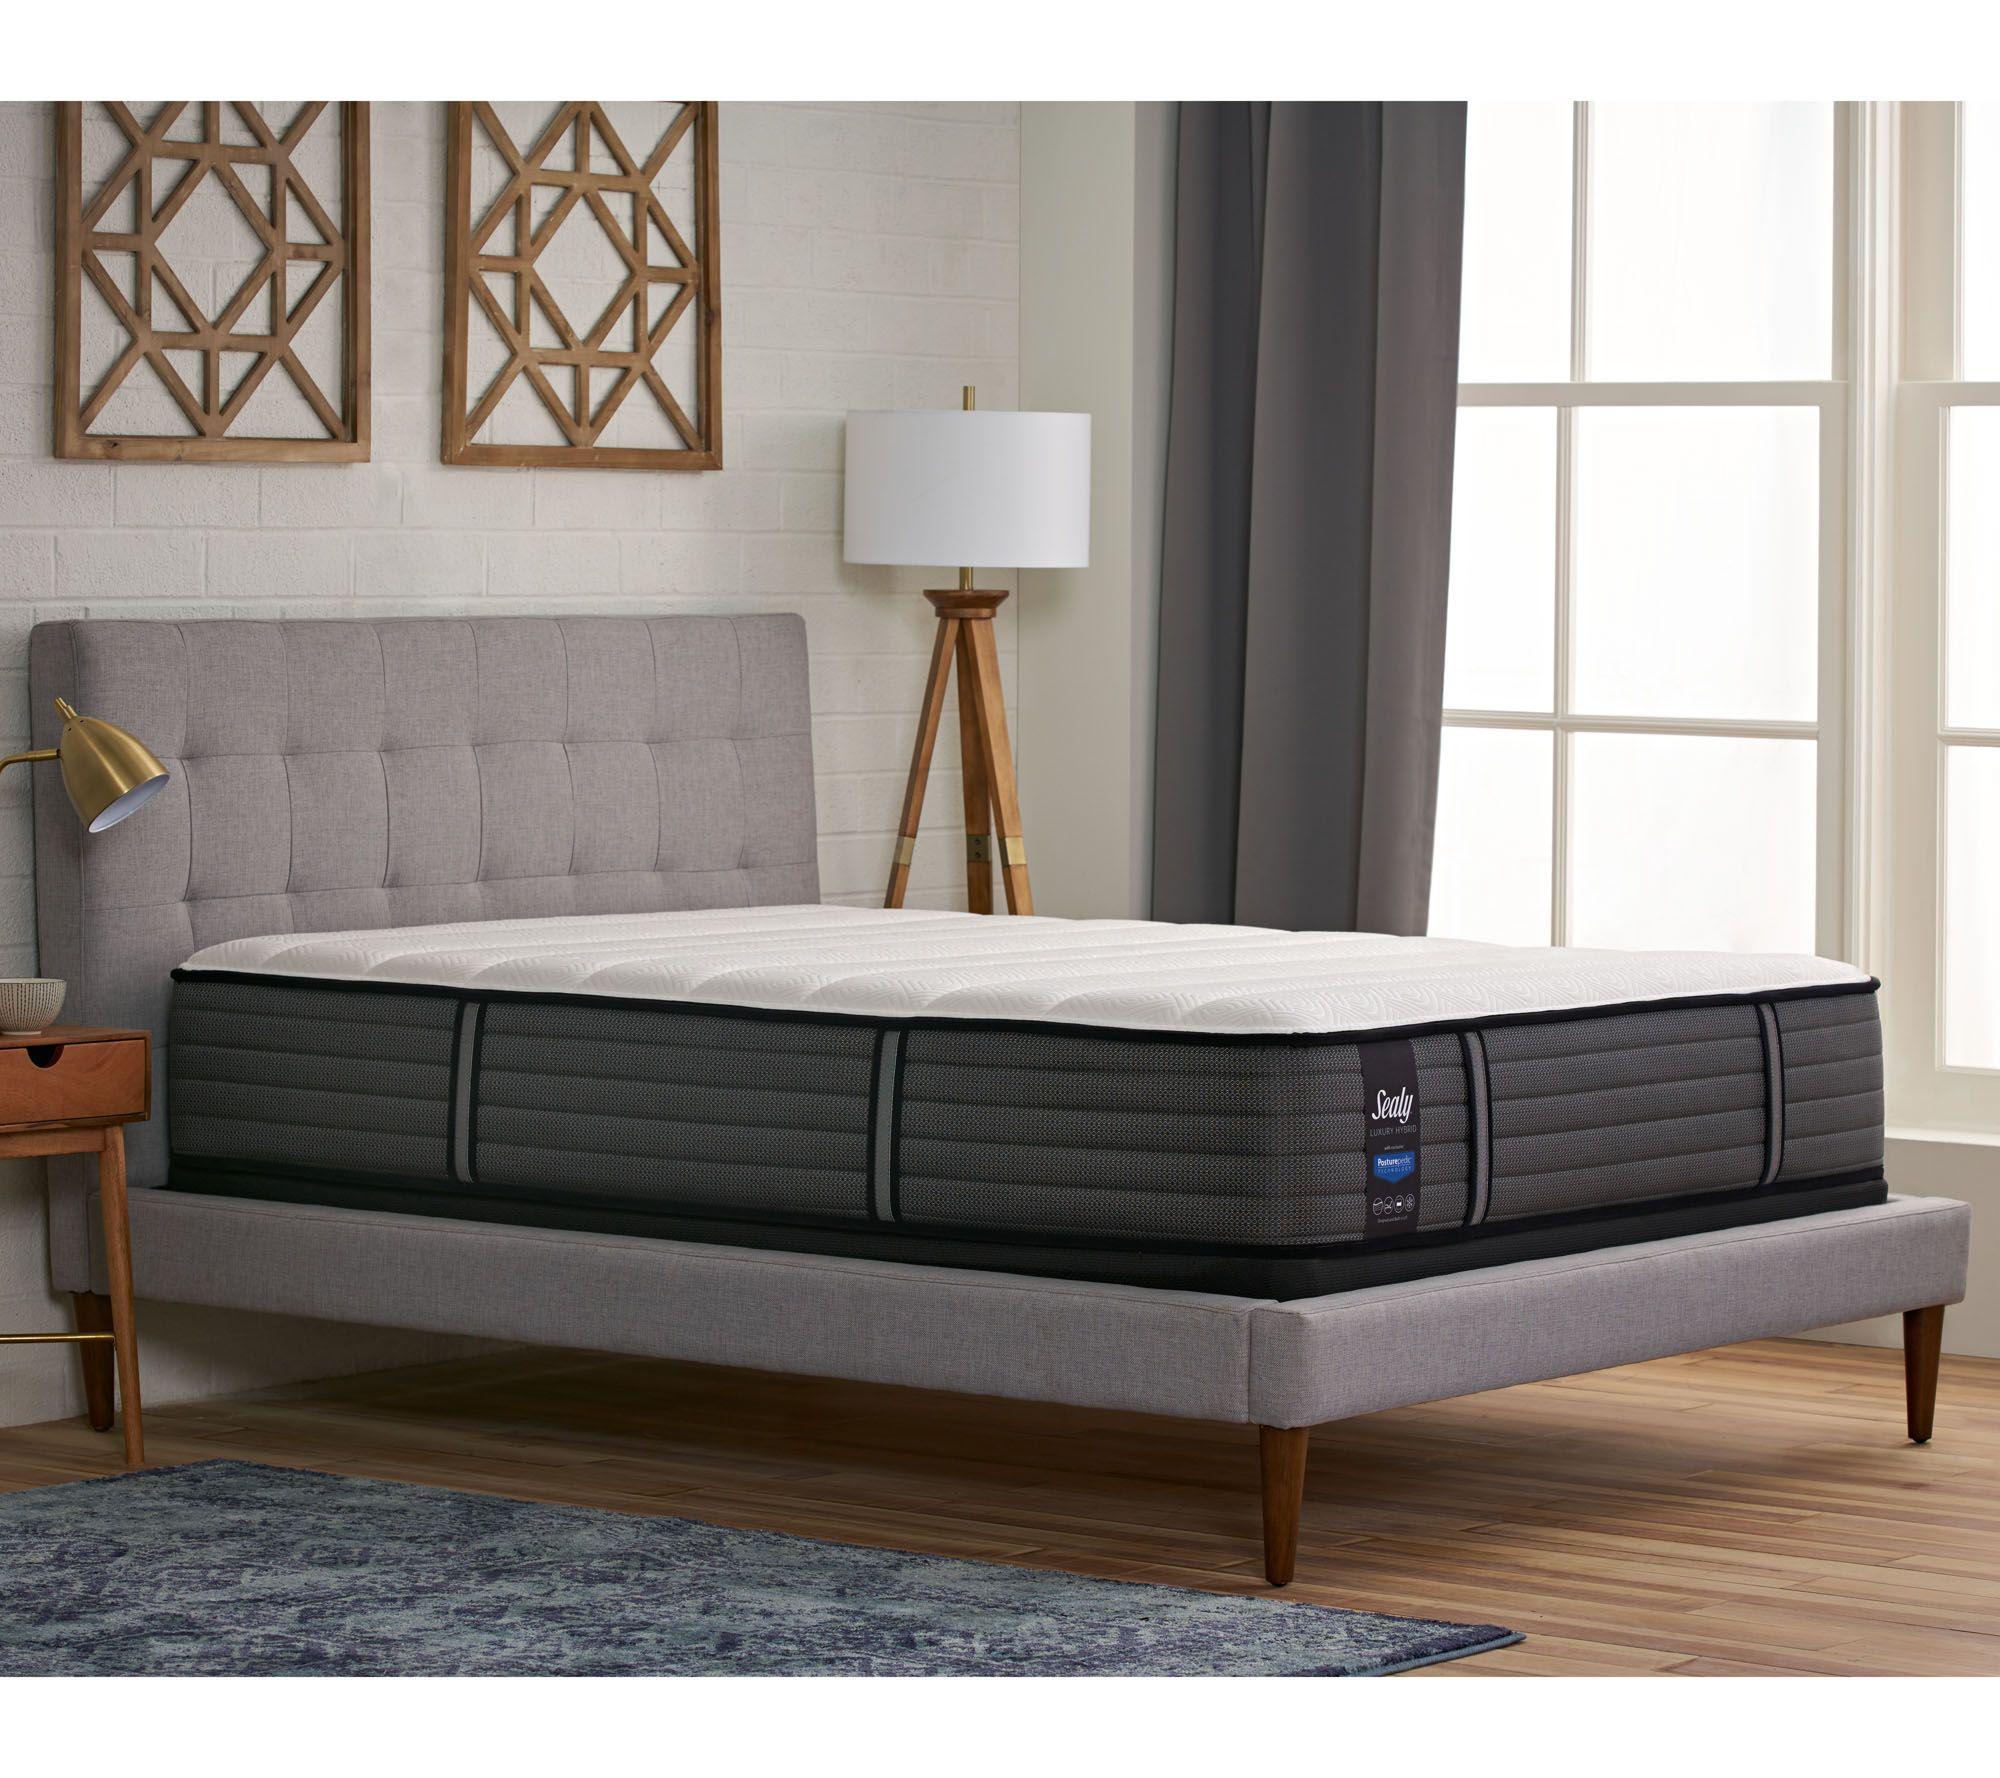 "Sealy Luxury Hybrid Cal King 13"" Cushion Firm Mattress Set - H212151"